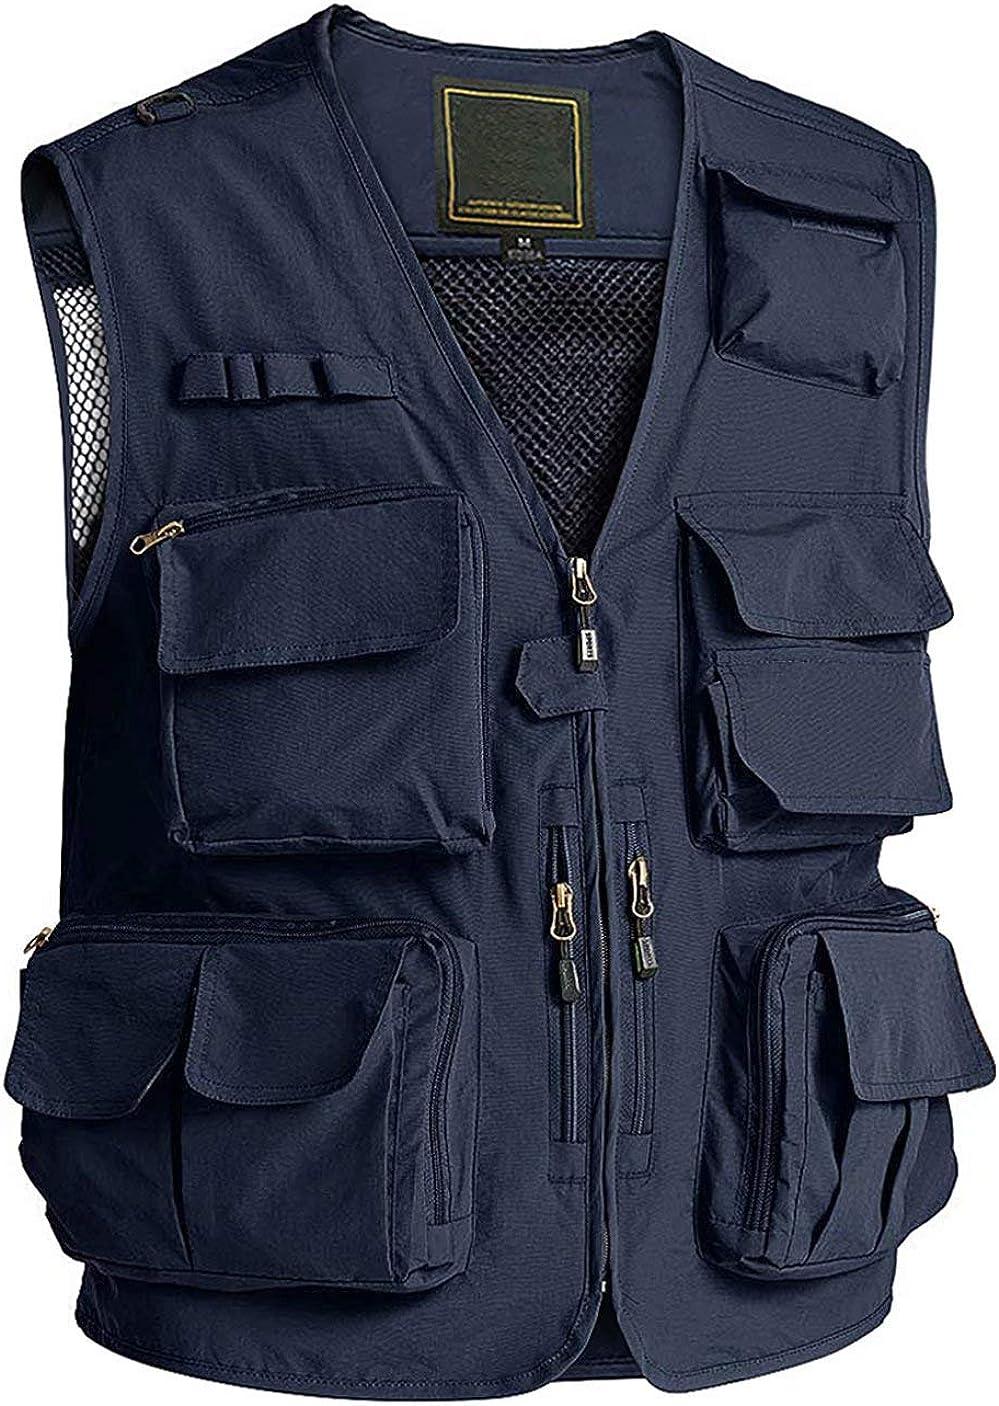 MAGCOMSEN Men's Outerwear Vests Casual Work Outdoor Multi P Vest Max Great interest 58% OFF